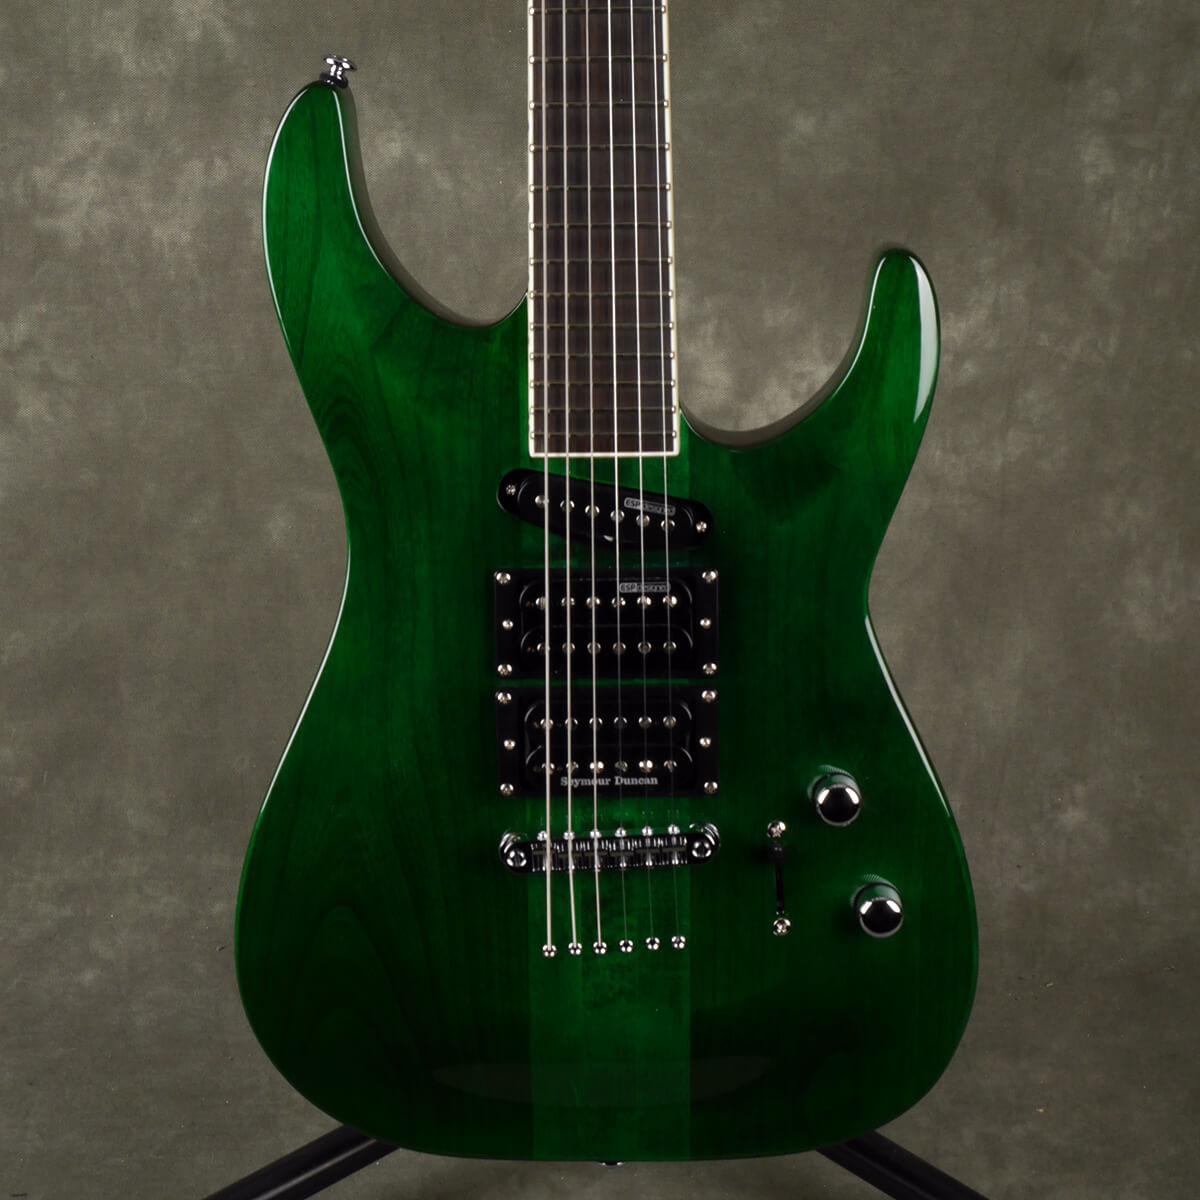 ESP LTD SC-20 STG Stephen Carpenter Signature - See-Thru Green - 2nd Hand